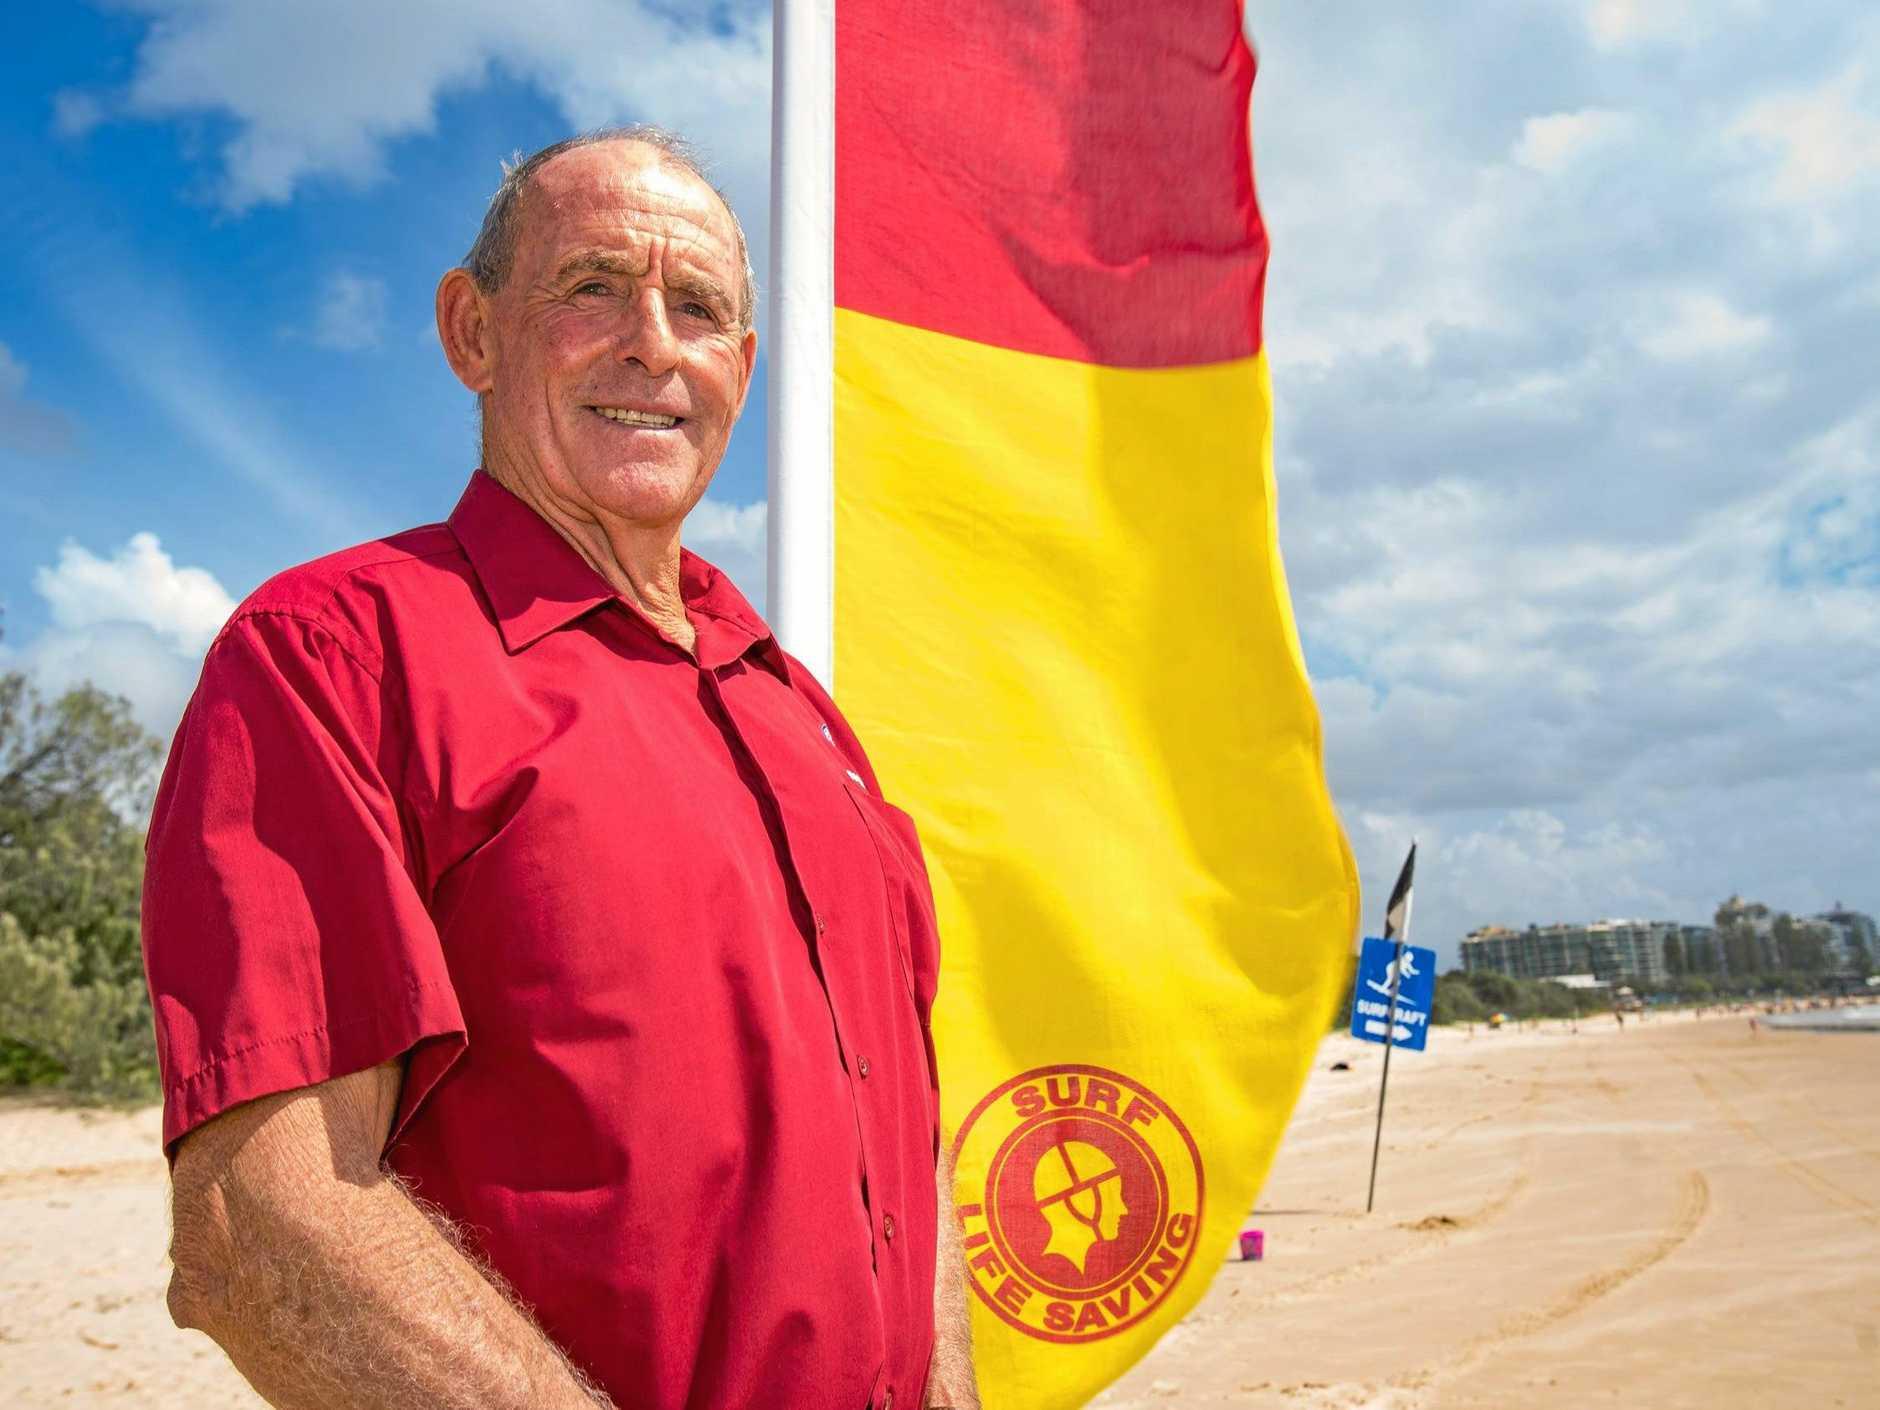 WATCHFUL: Surf Life Saving Queensland's Sunshine Coast branch president John Thorpe keeps an eye on the beach.